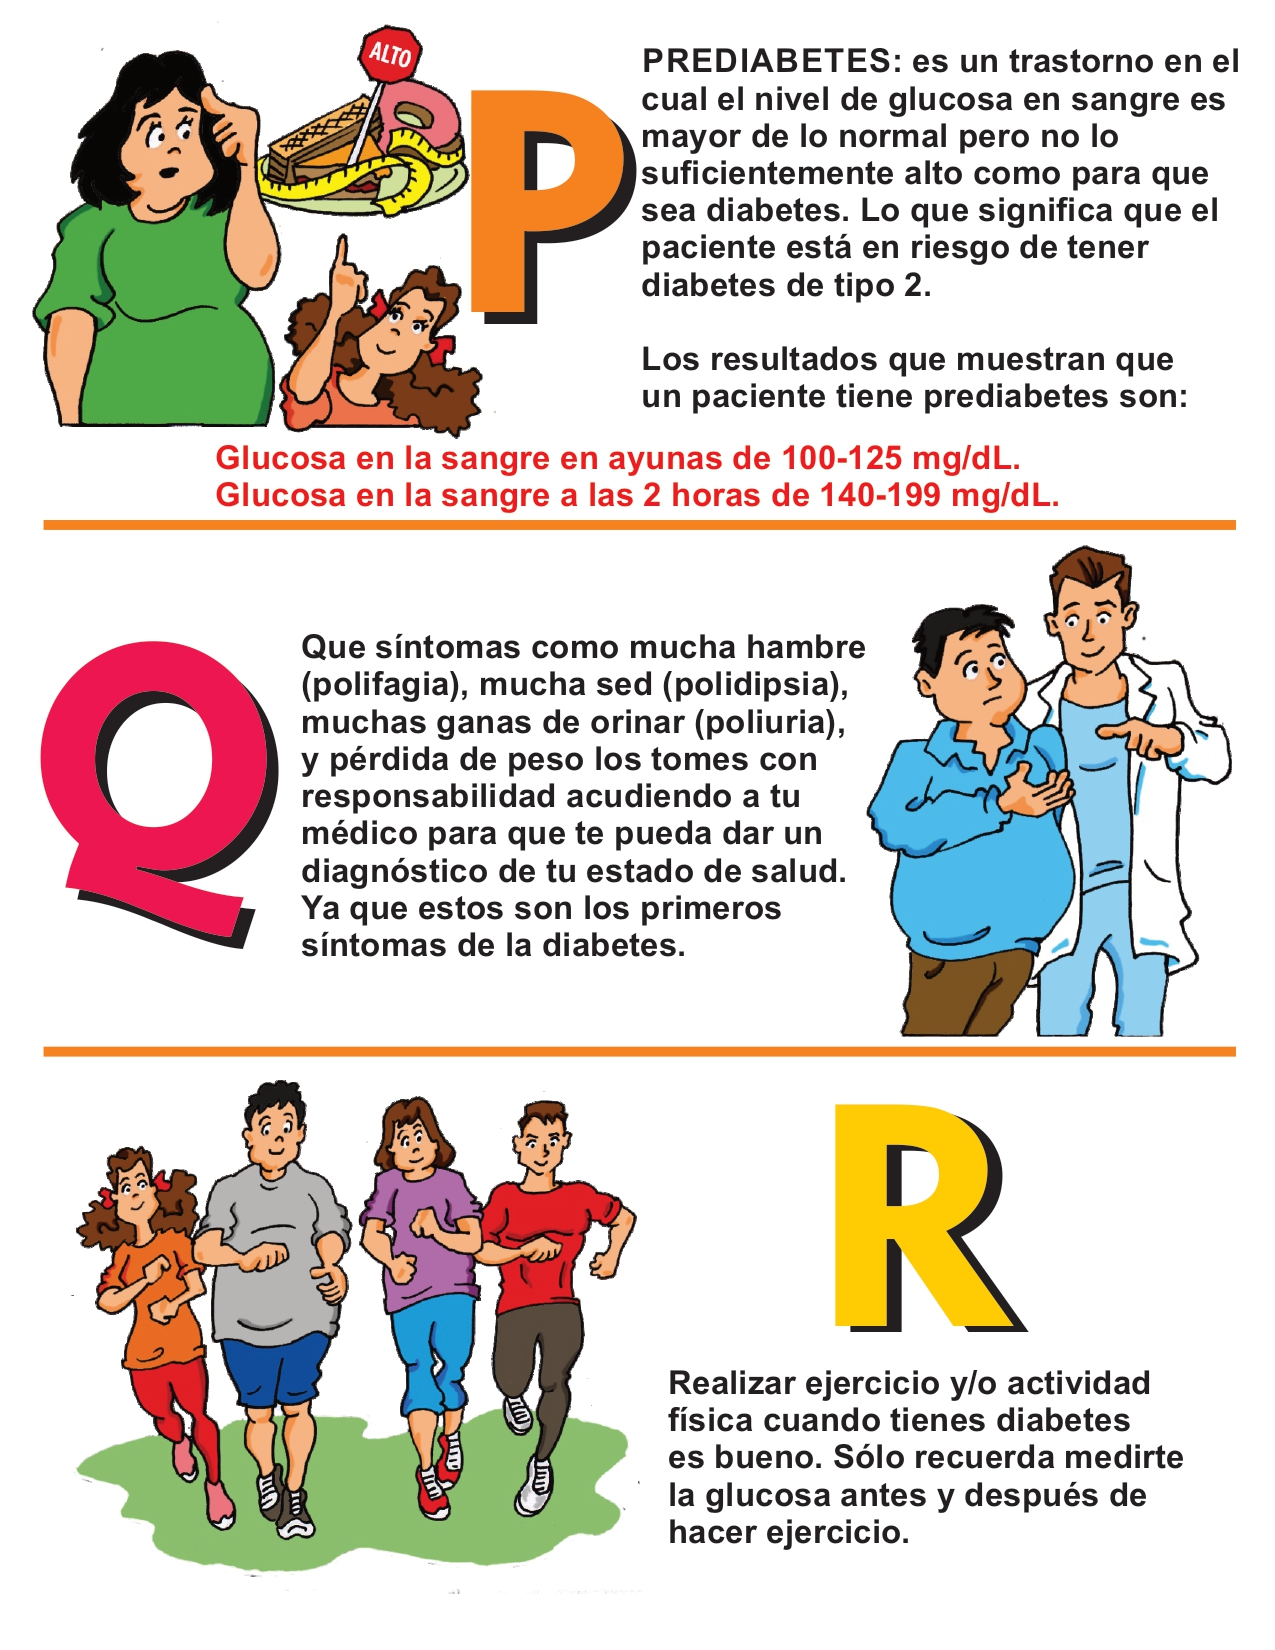 ABC automonitoreo diabetes_pages-to-jpg-0008